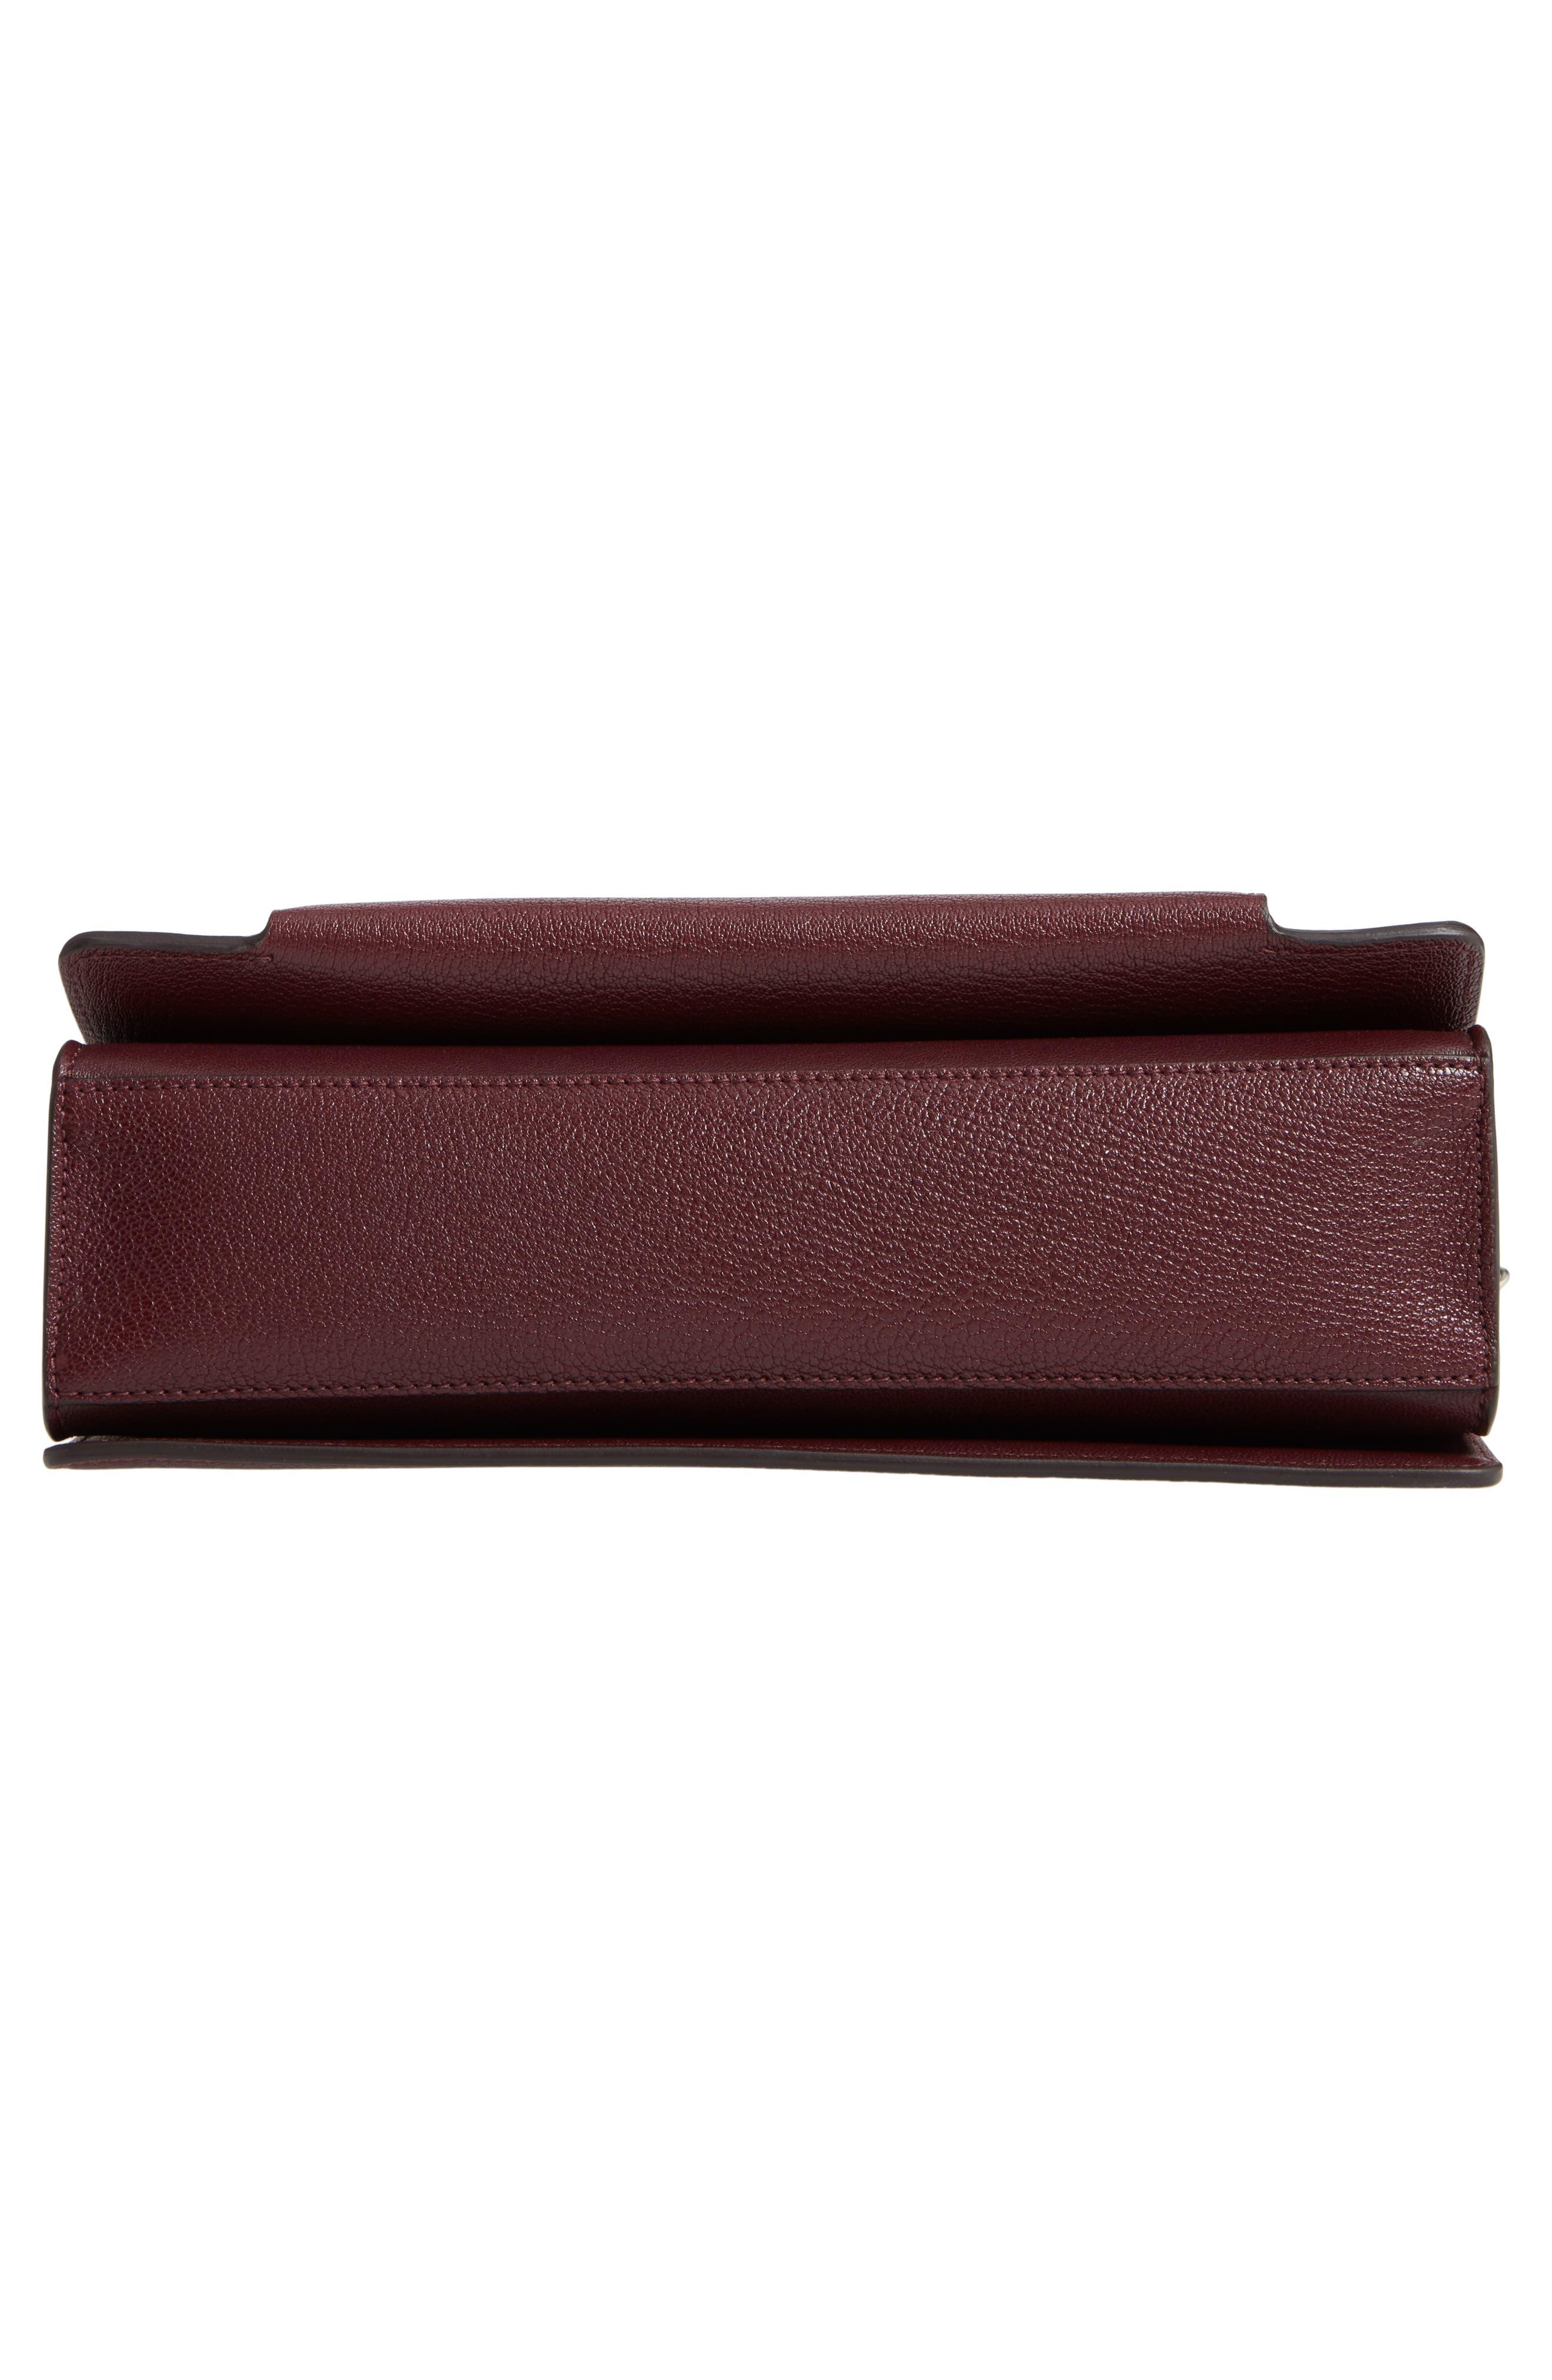 GV3 Goatskin Leather Shoulder Bag,                             Alternate thumbnail 6, color,                             AUBERGINE